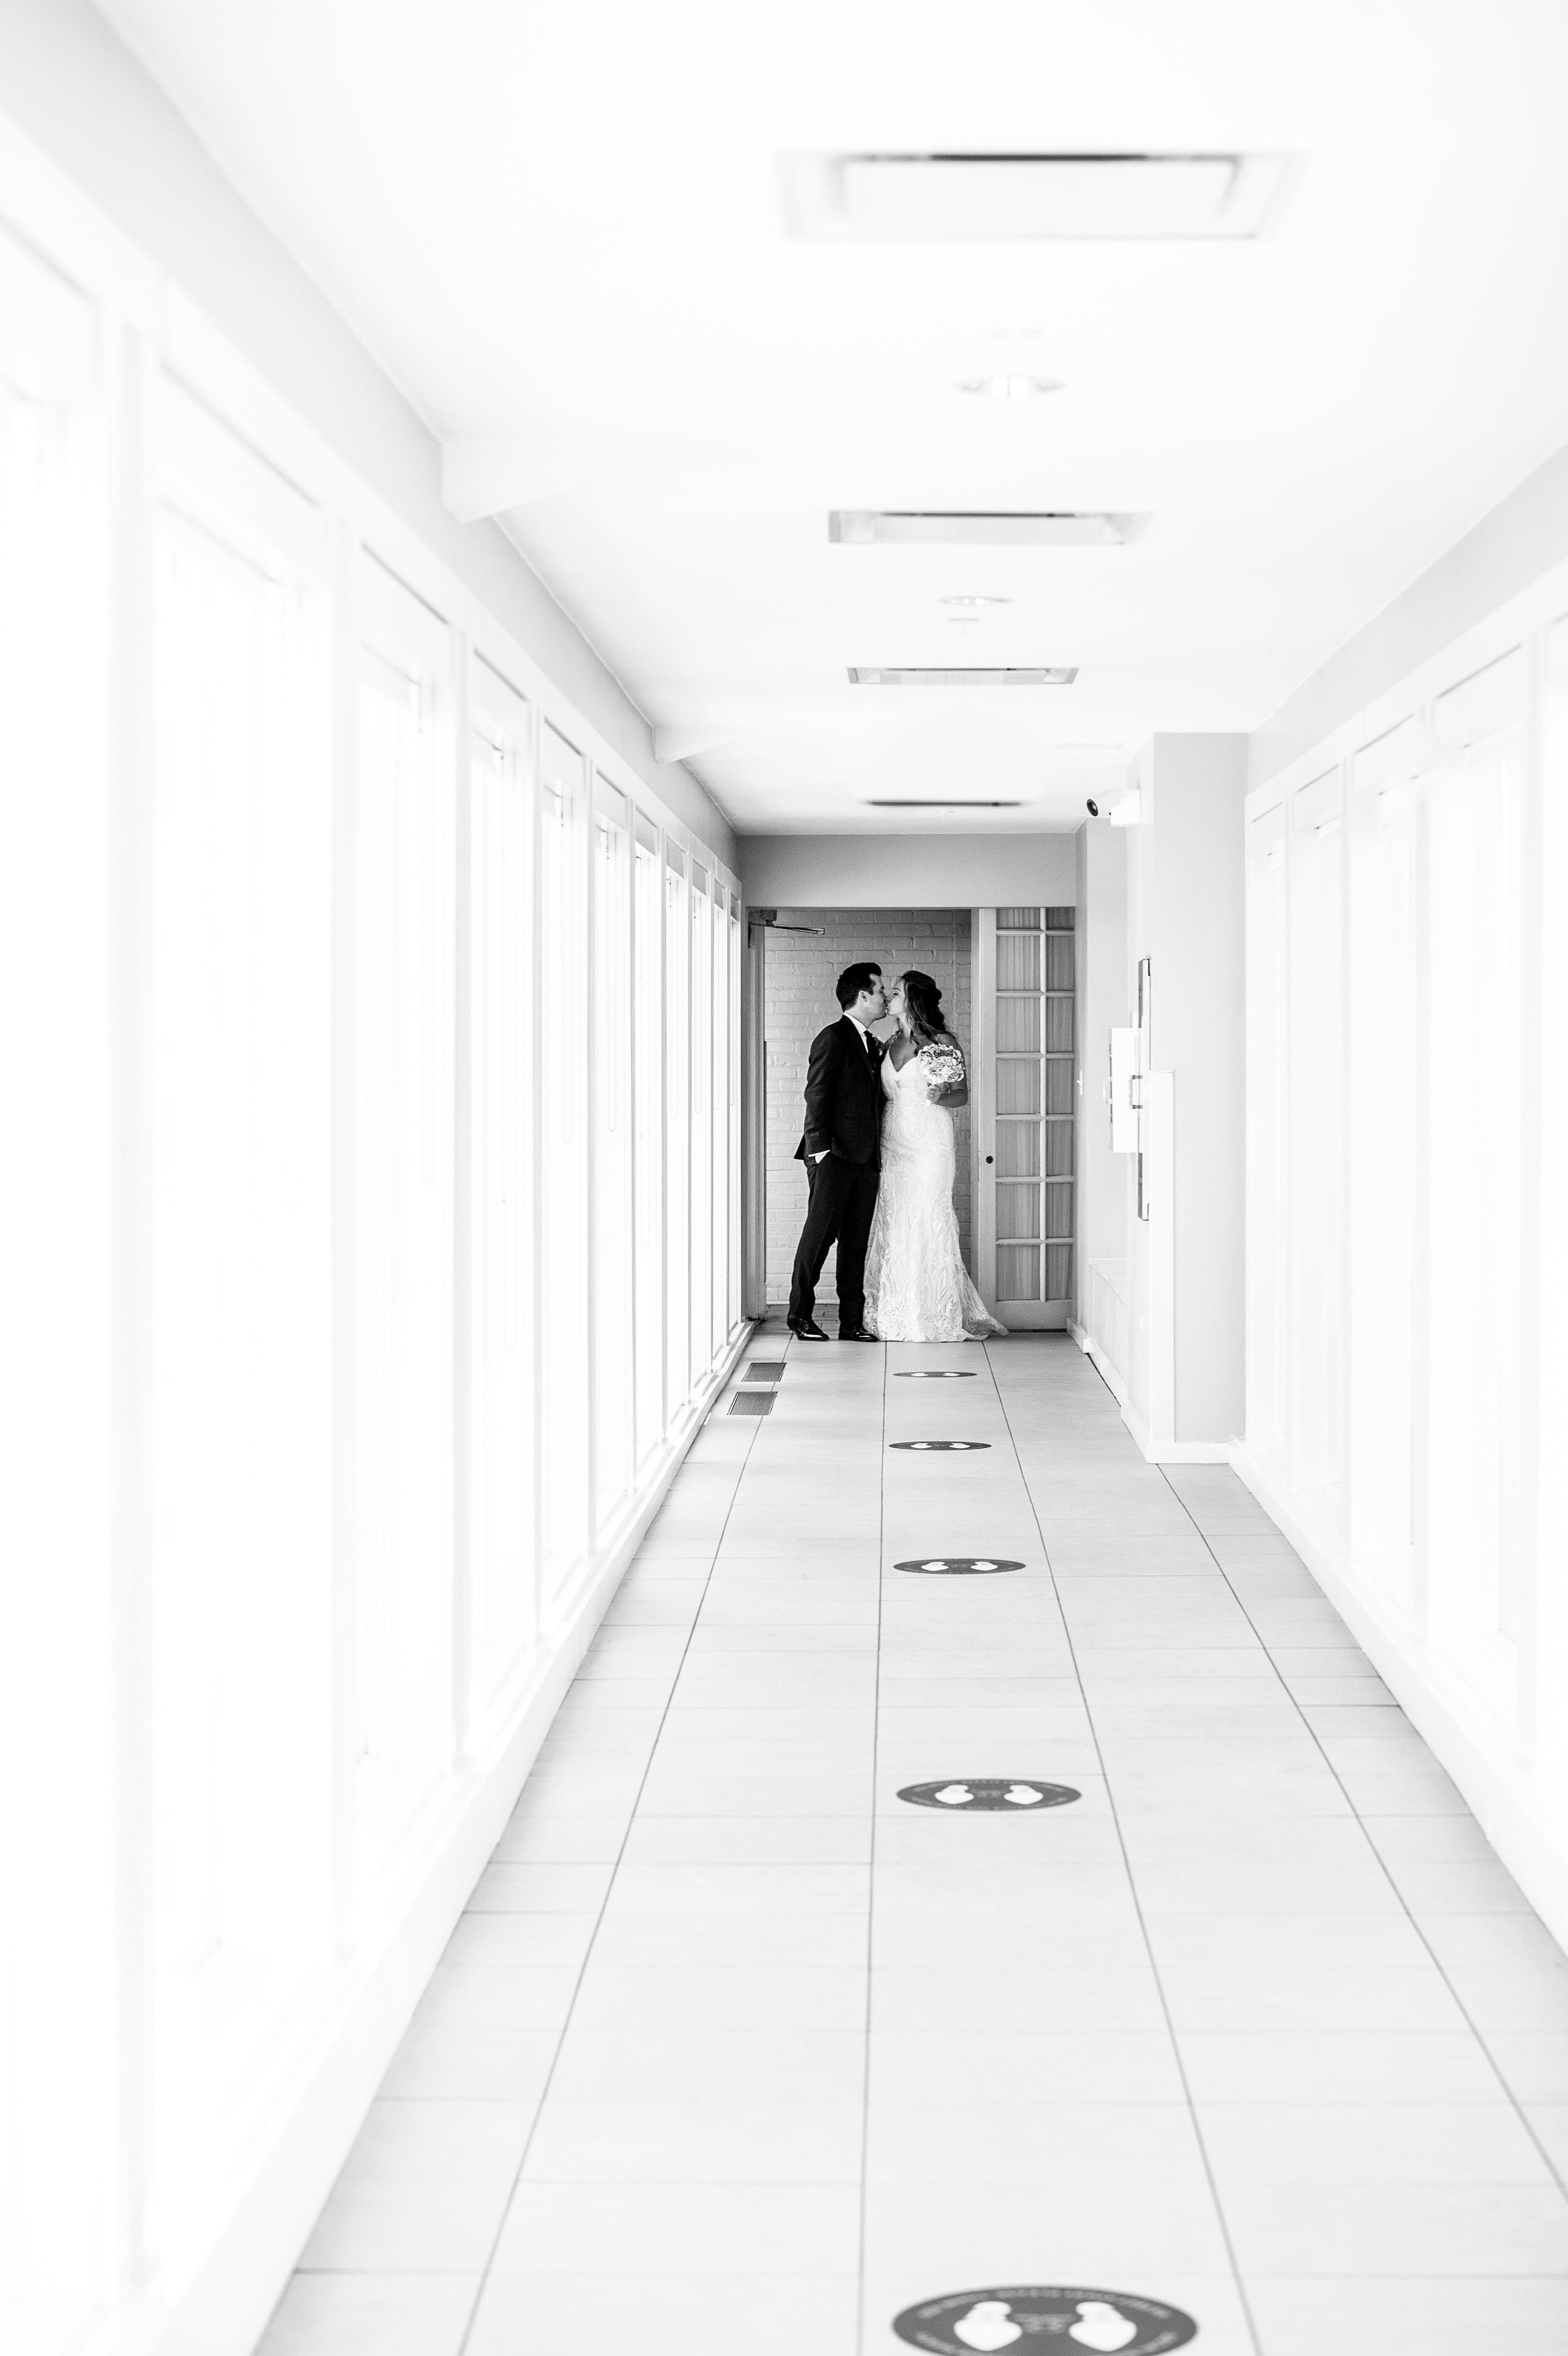 barn wedding venue,wedding pictures at Danada house